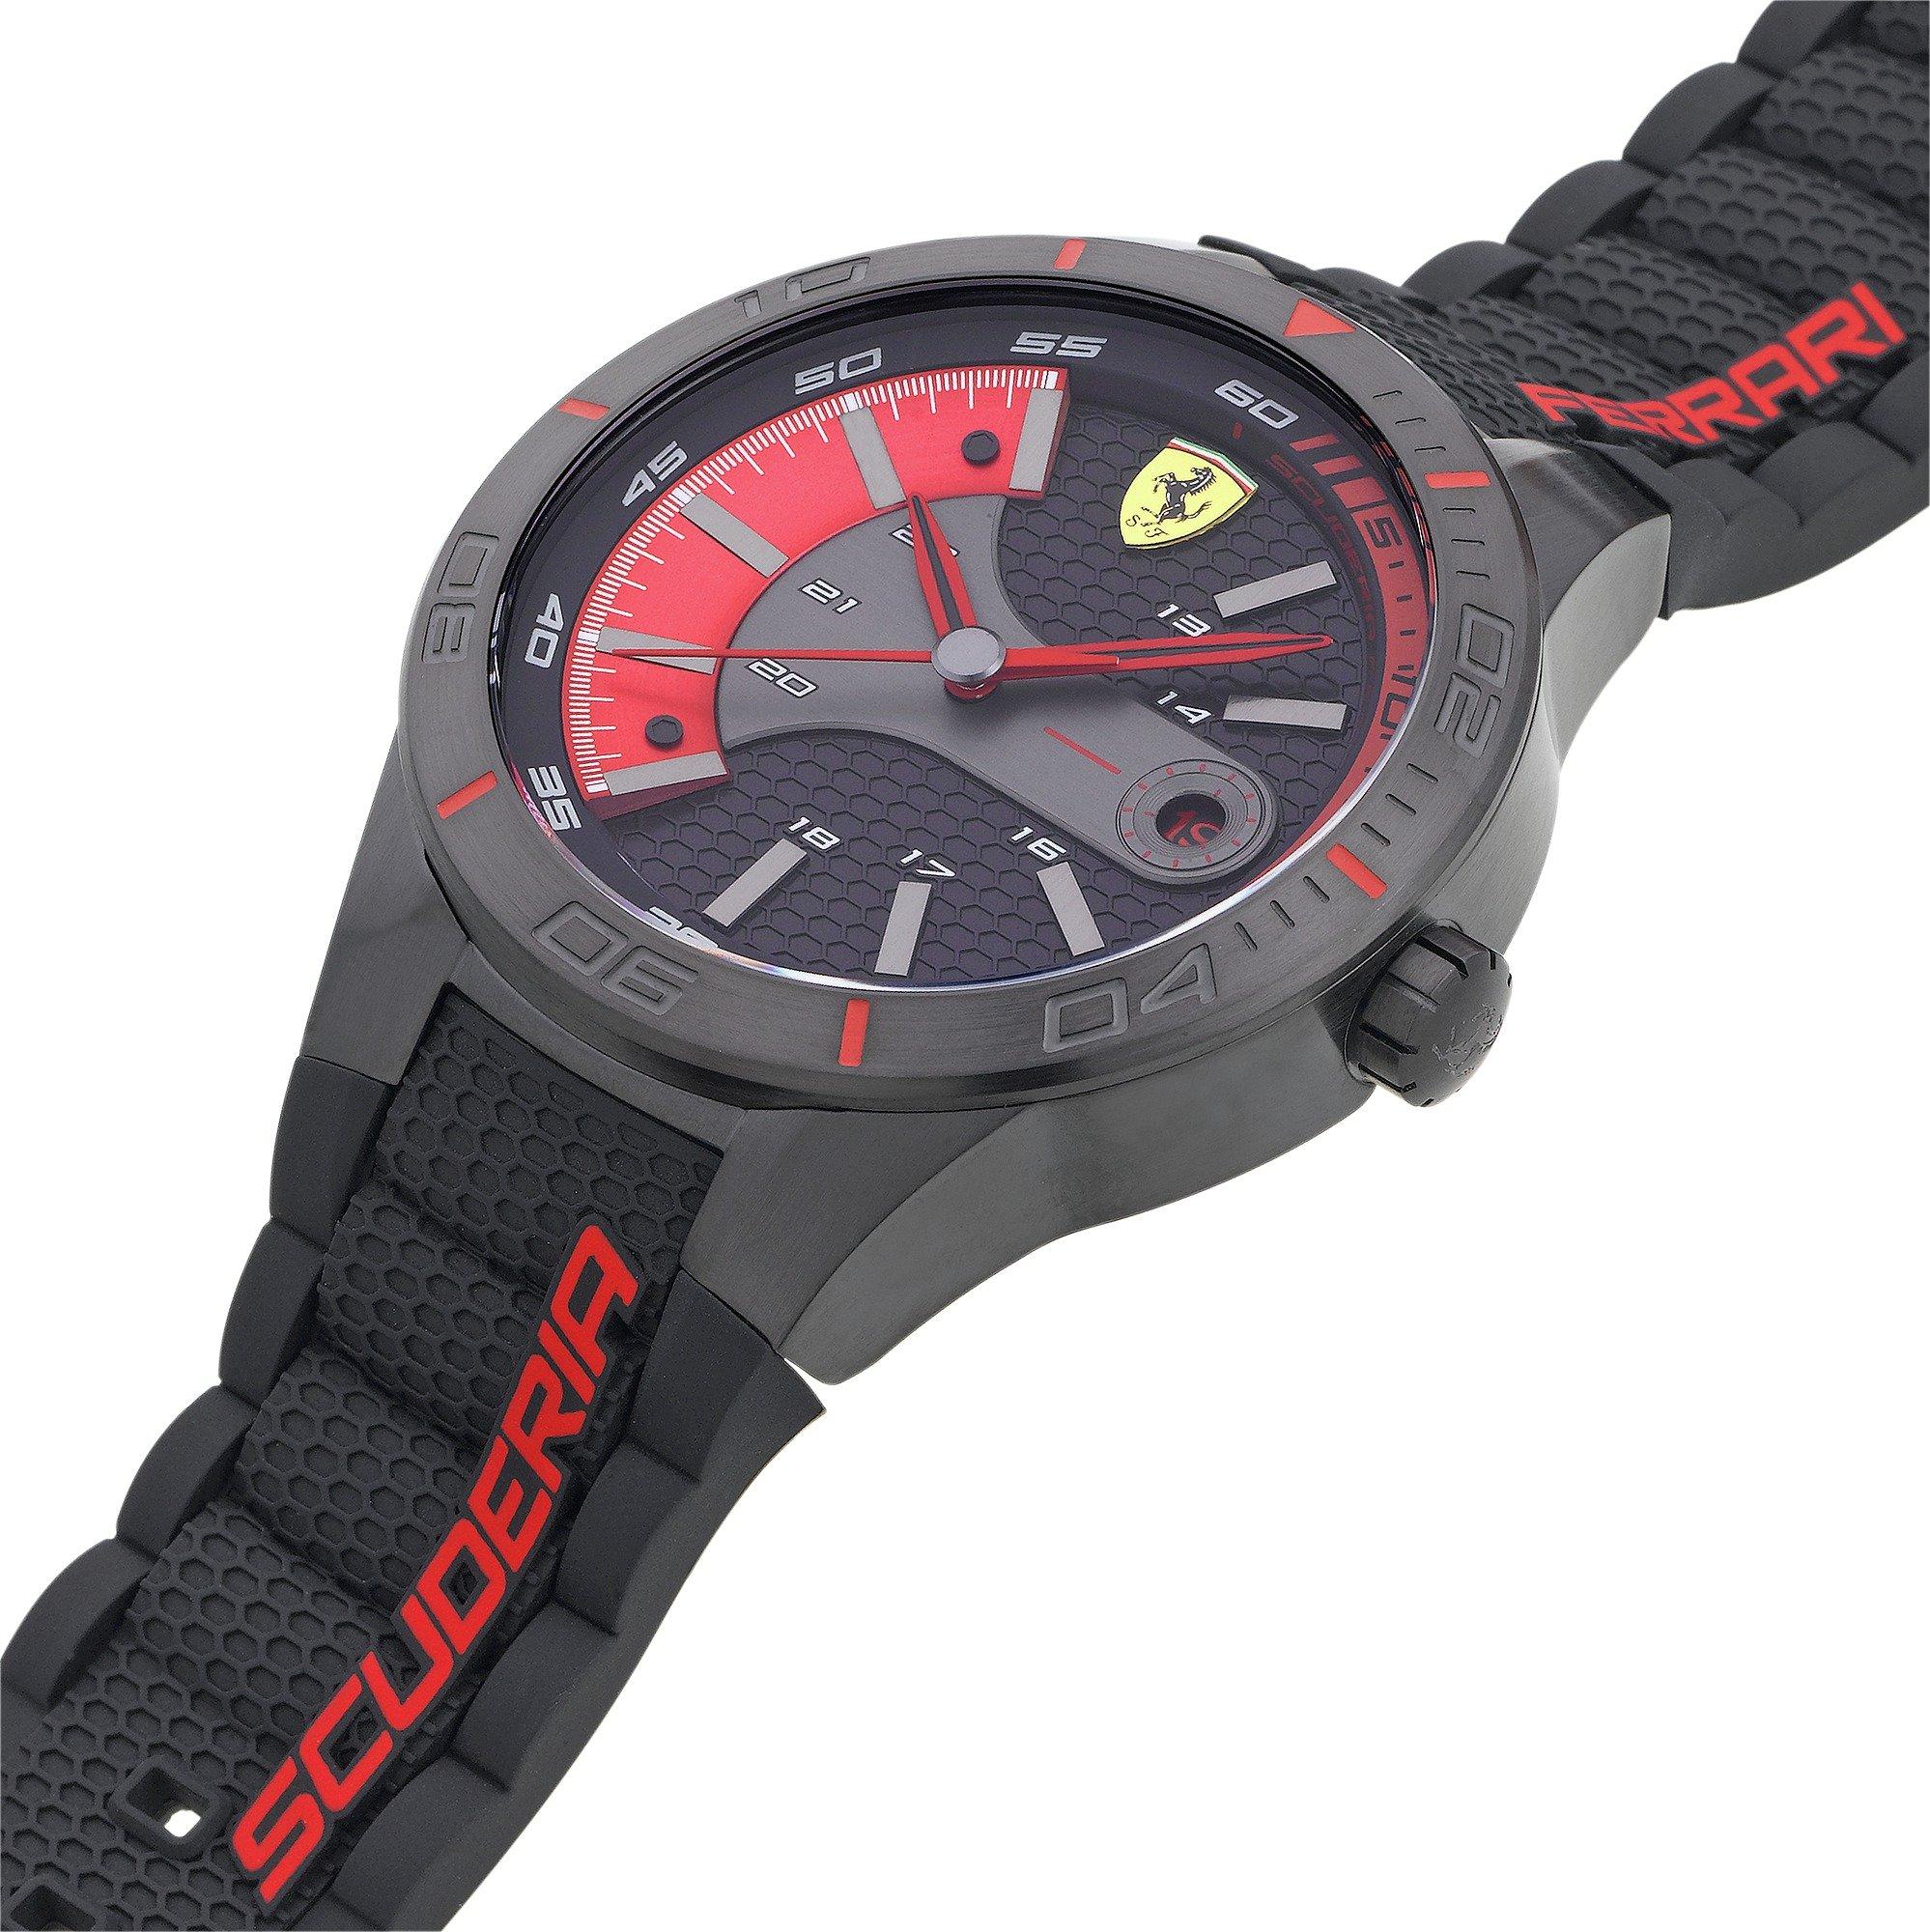 buy scuderia ferrari men's red rev evo strap watch at argos.co.uk